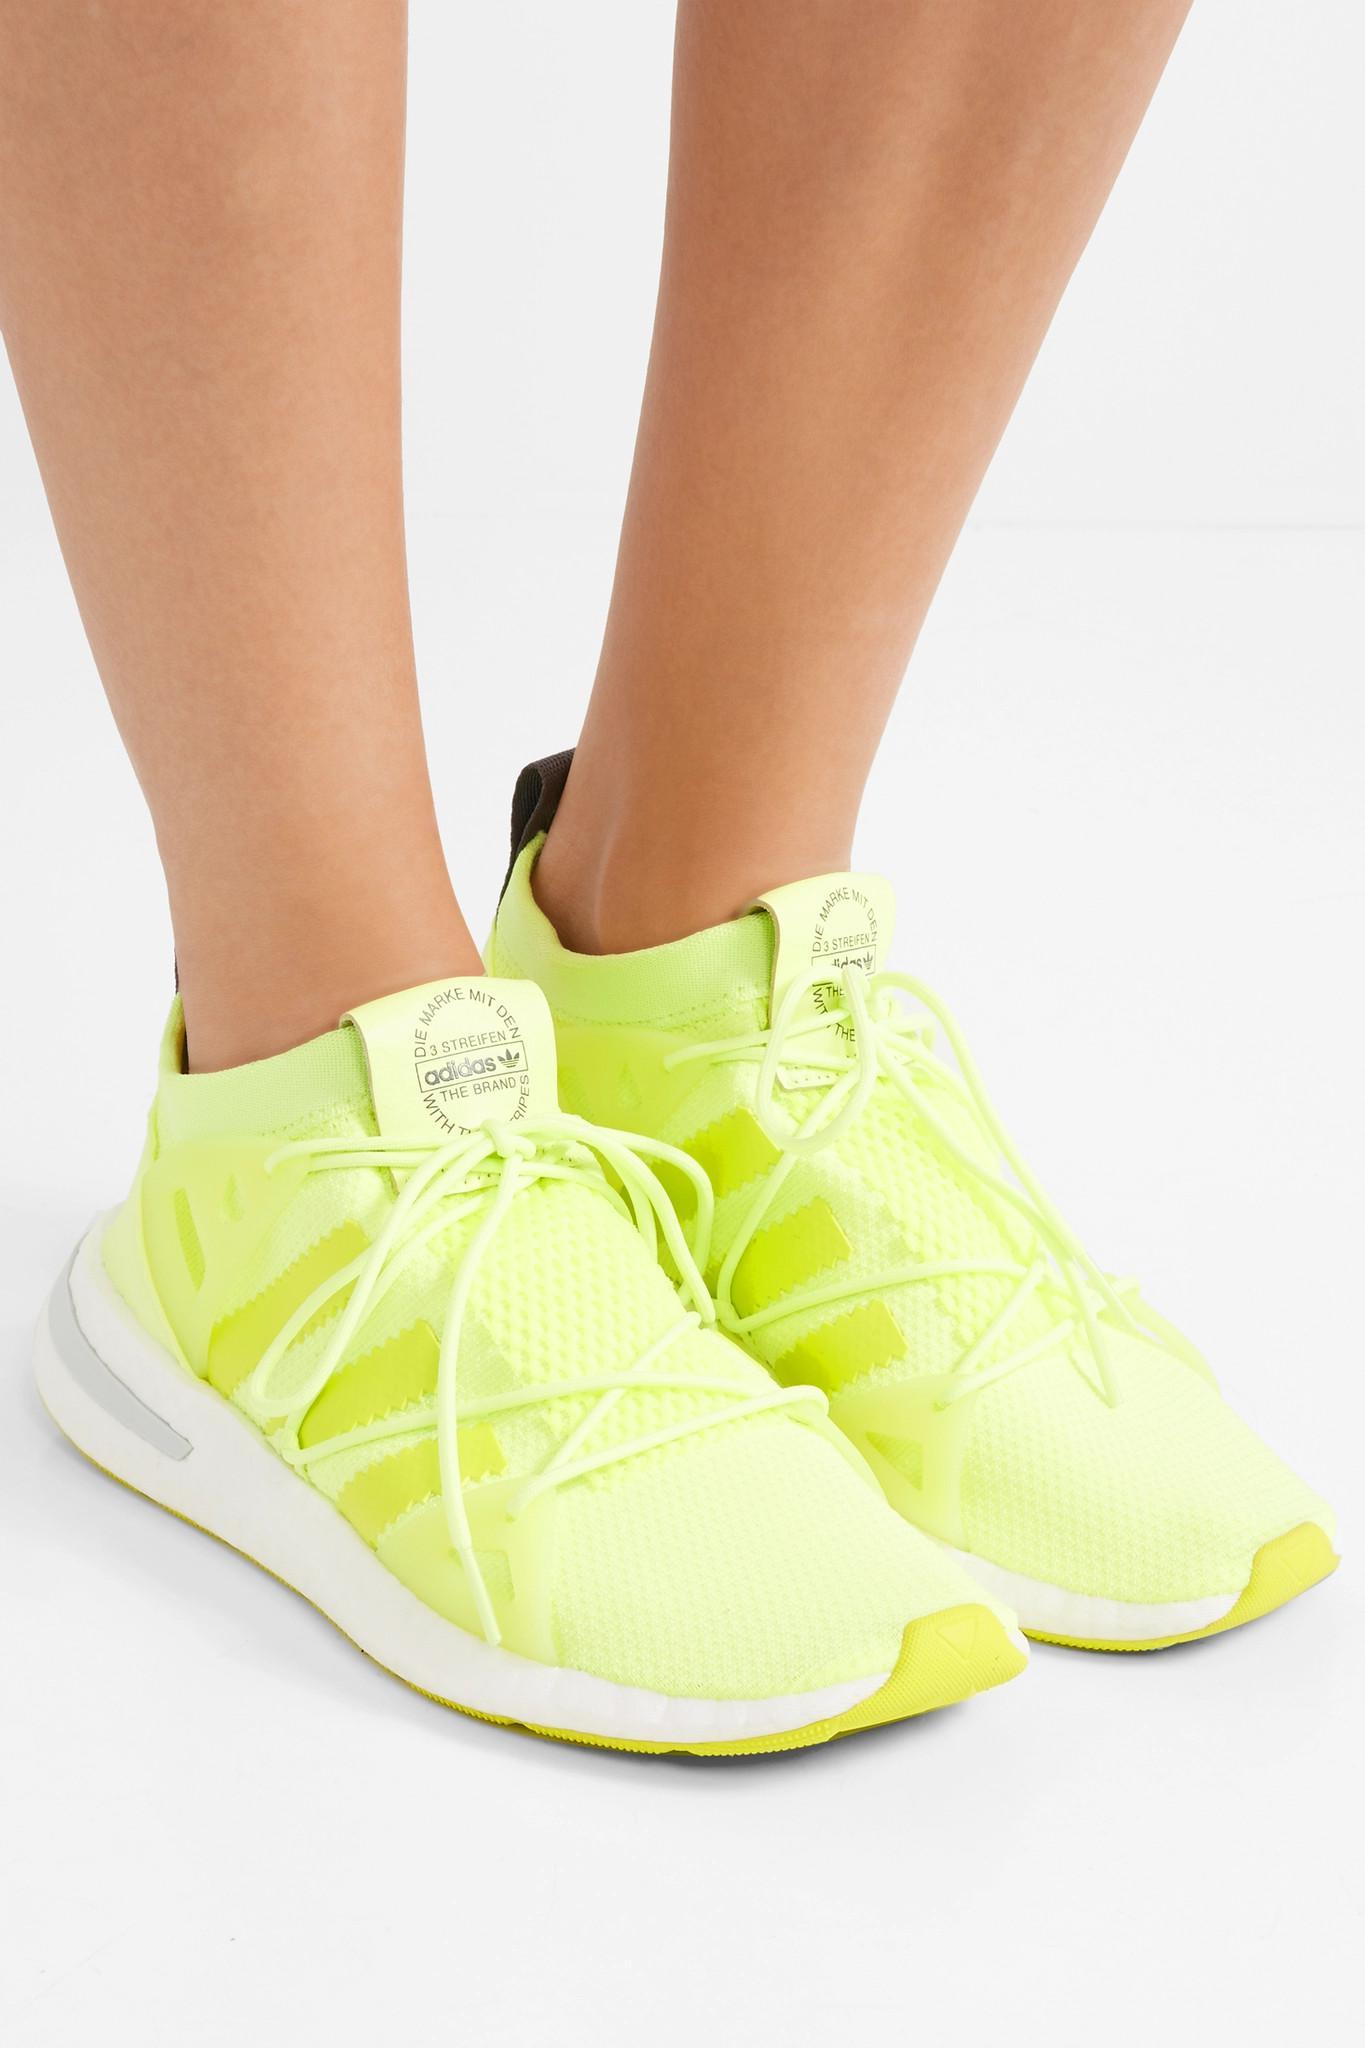 b54f8c2665c1 Adidas Originals - Yellow Arkyn Rubber-trimmed Neon Mesh Sneakers - Lyst.  View fullscreen